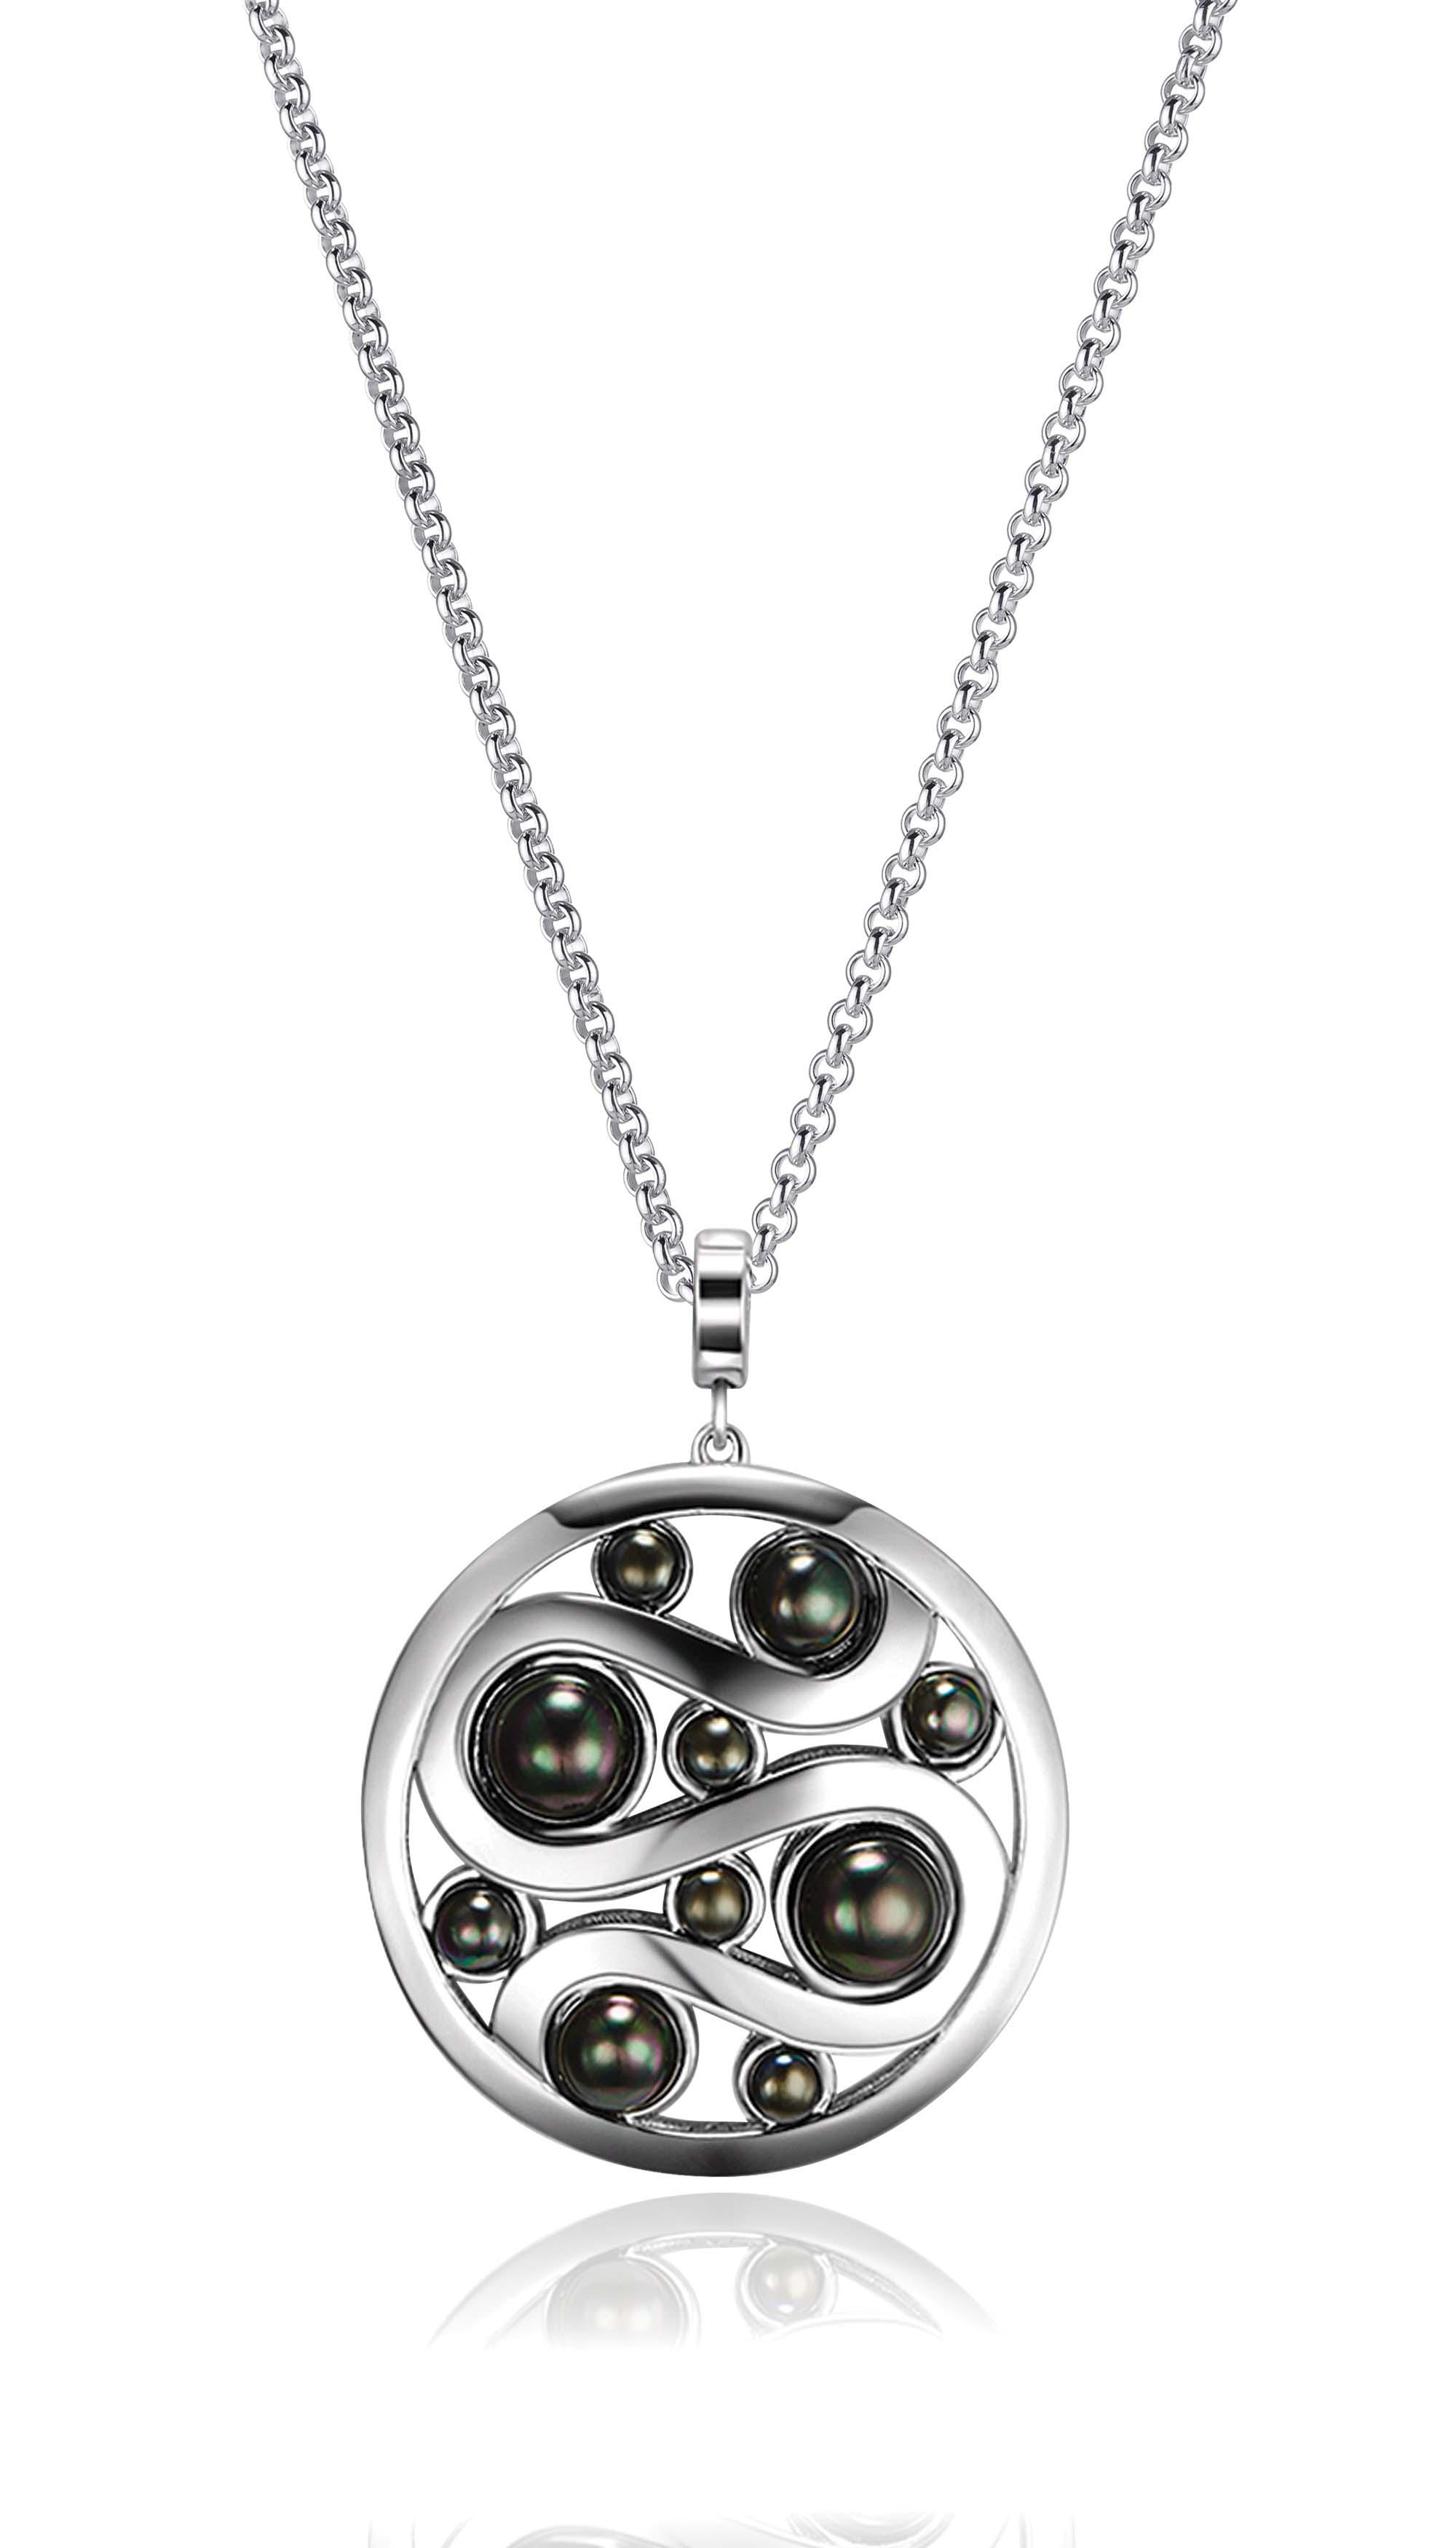 Kagi Steel Me Petite Necklace 47cm $129 with Mystic Pearl Pendant (Dark Side) $249 www.kagi.net